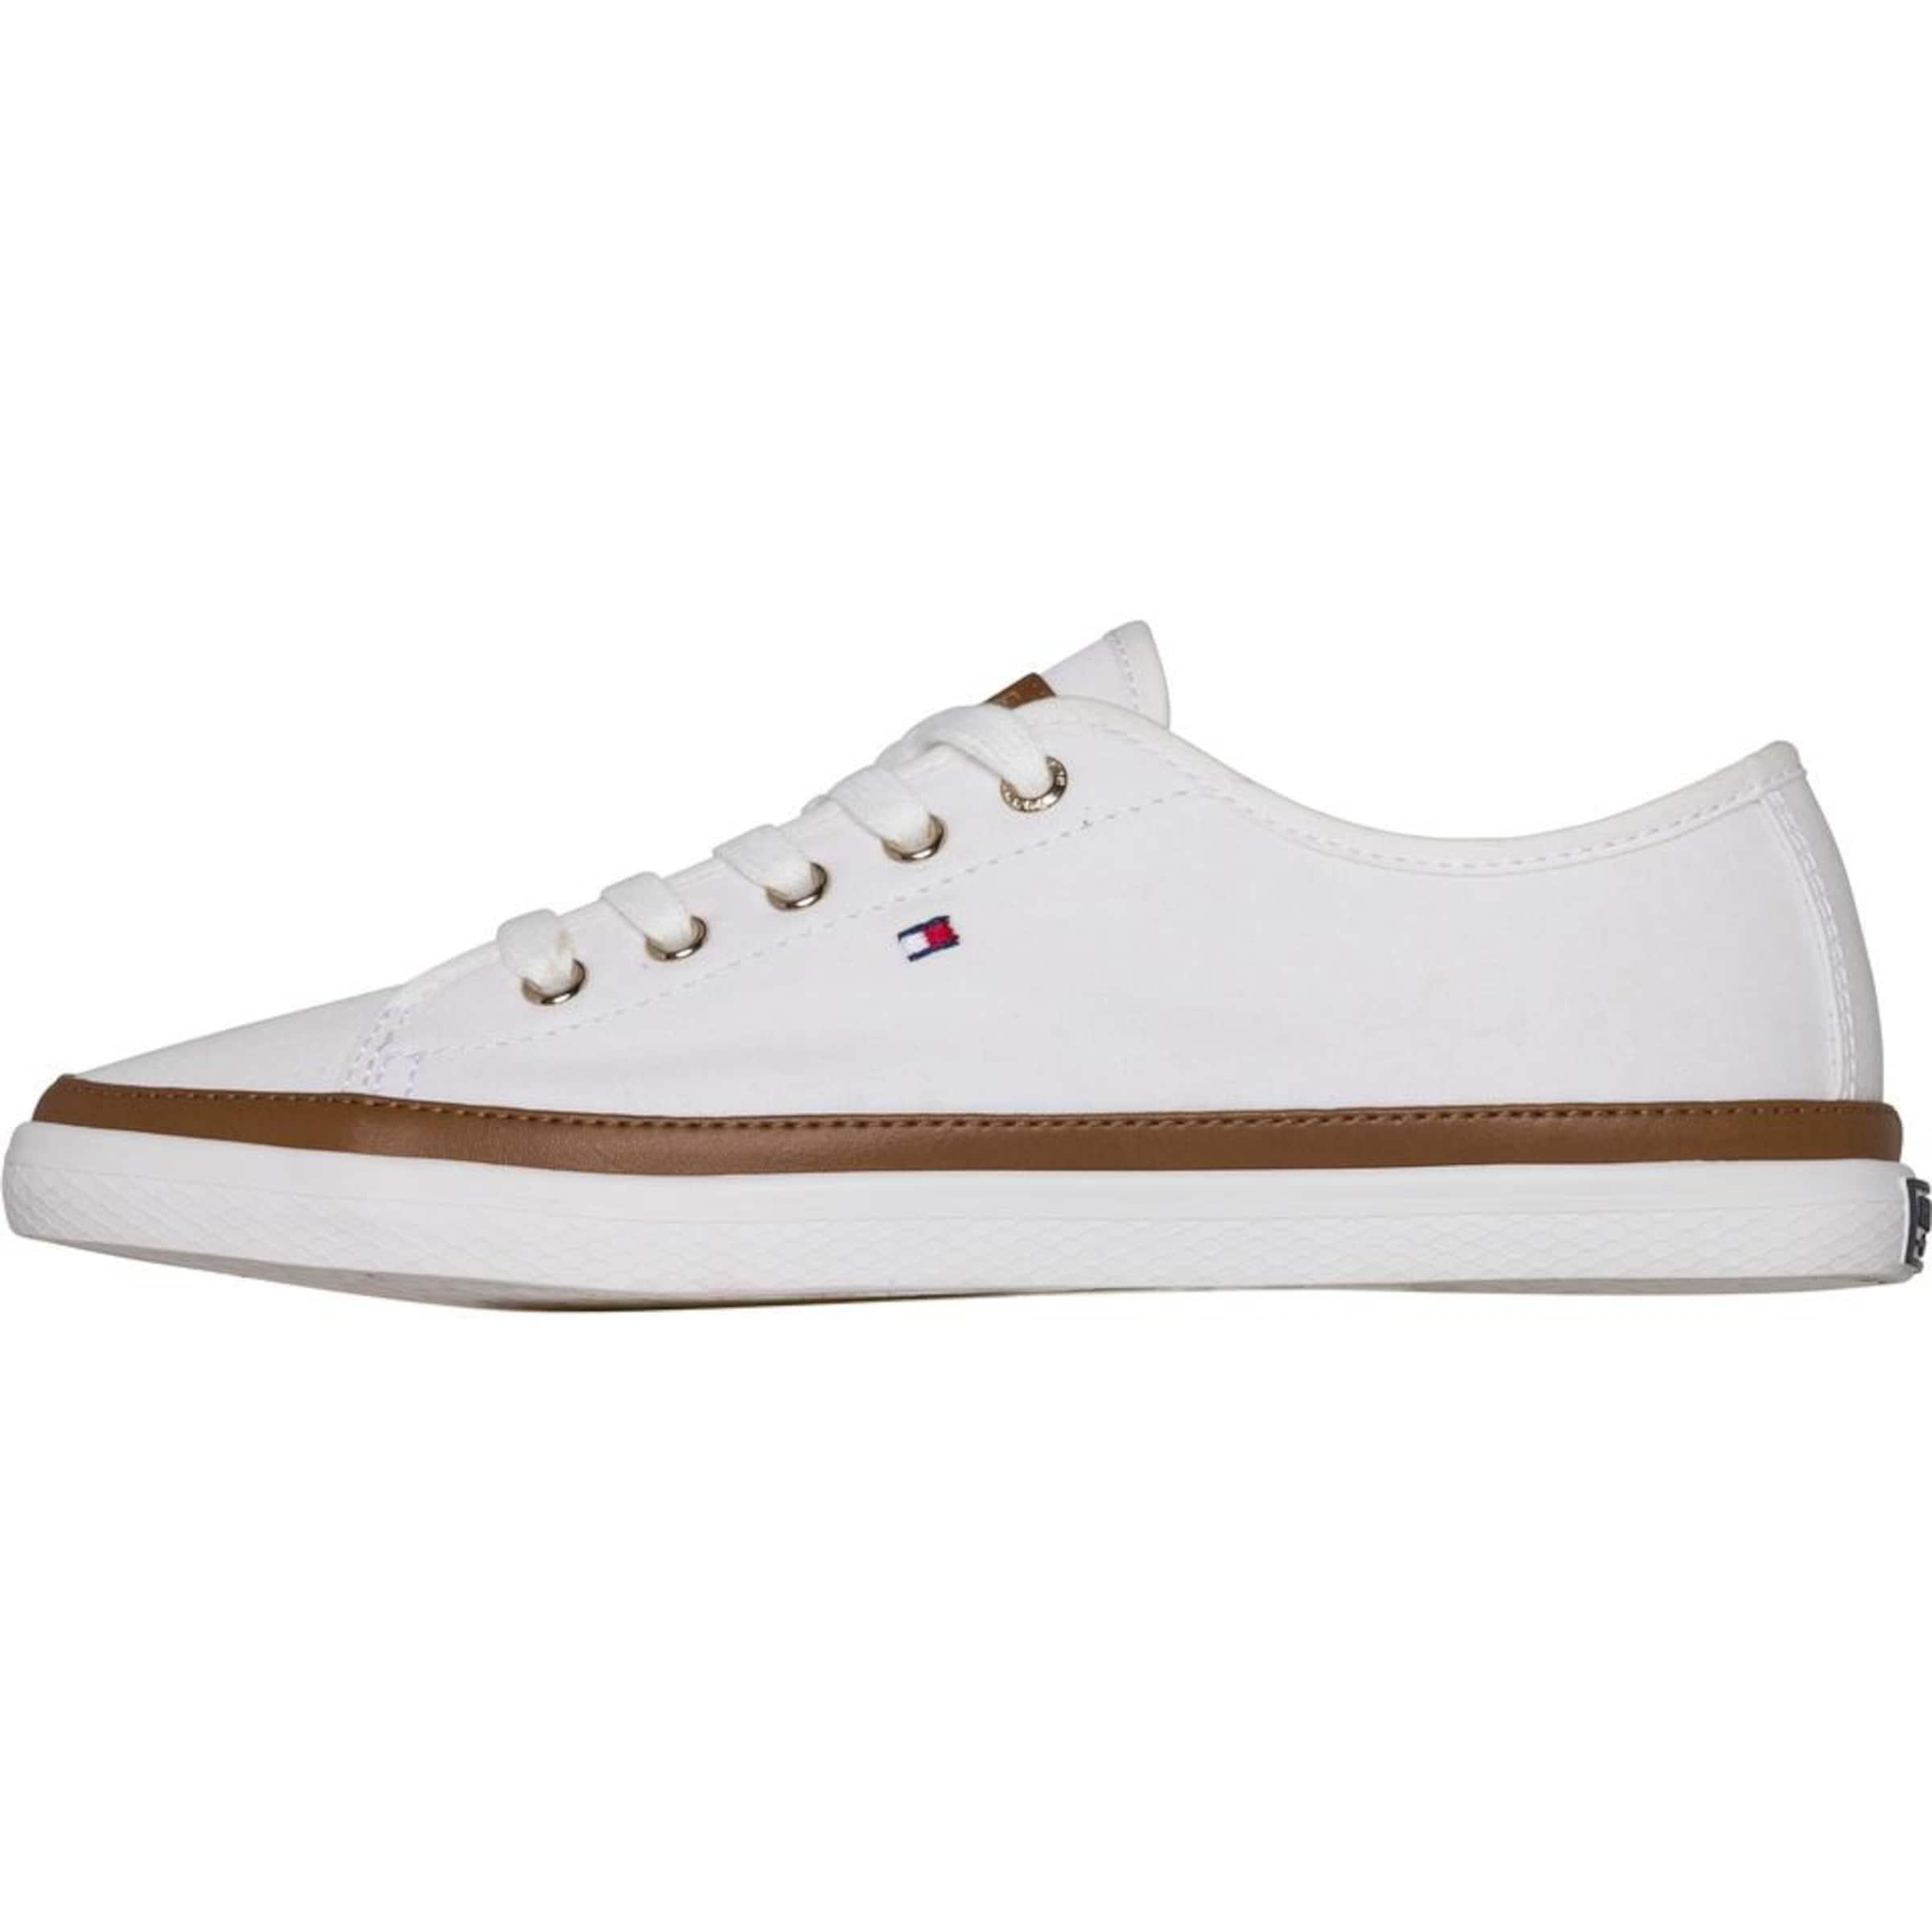 TOMMY HILFIGER HILFIGER TOMMY | Sneaker, WHISPER WHITE 06bf14